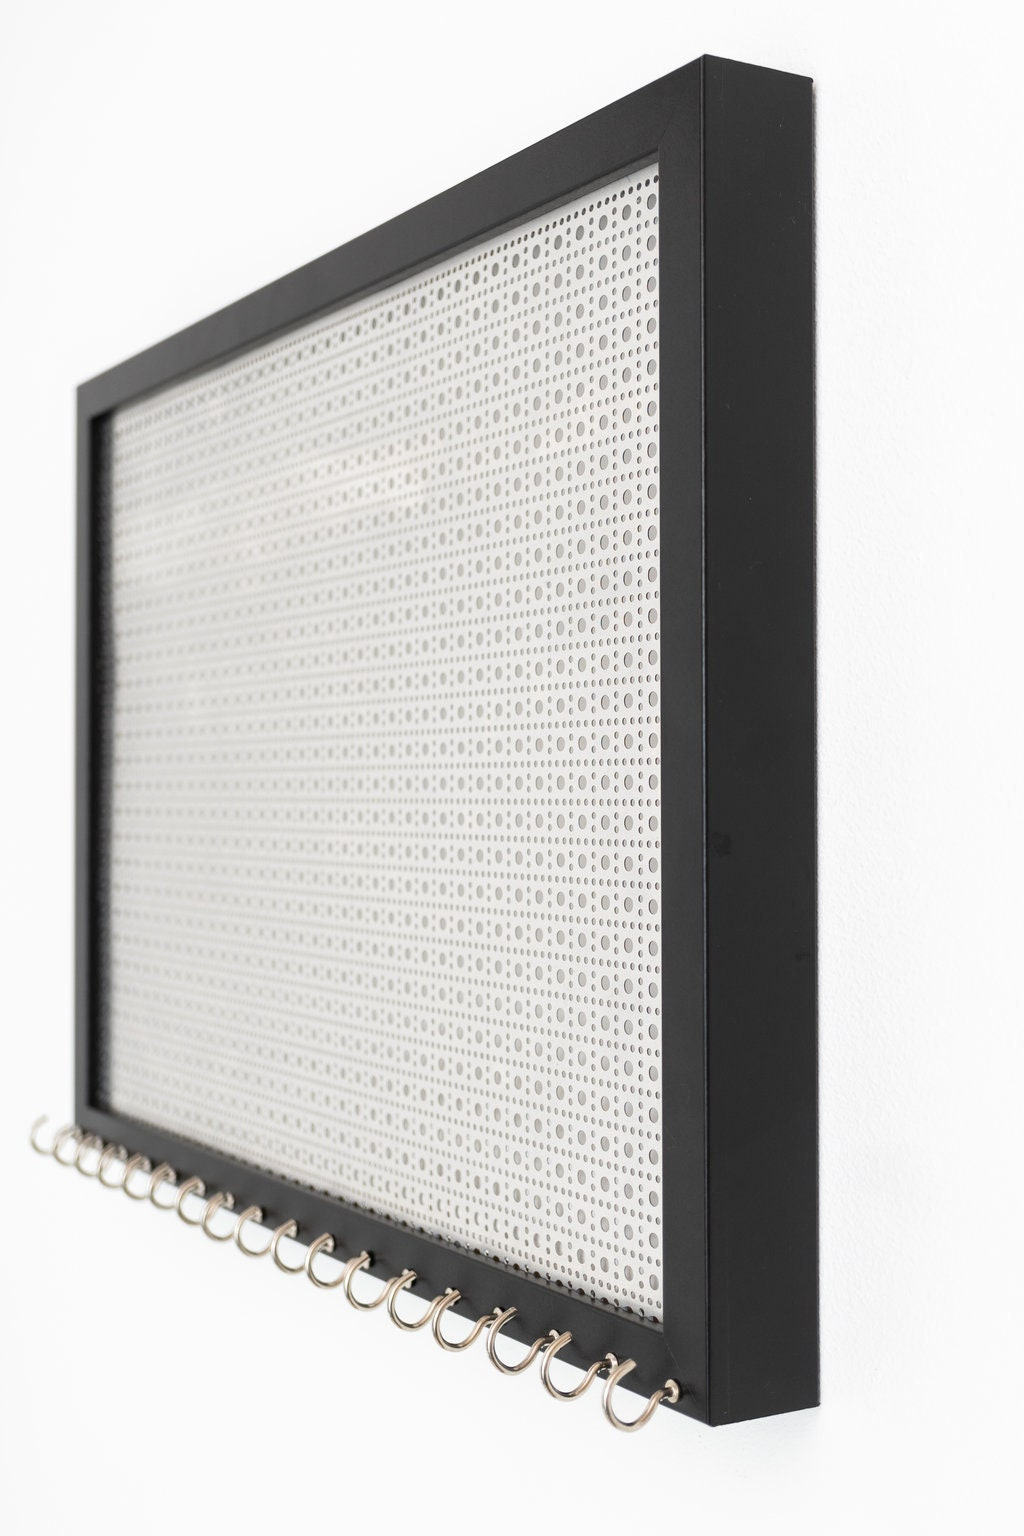 13x17 Ultimate Hanging Jewelry Organizer - Black Frame - Silver ...